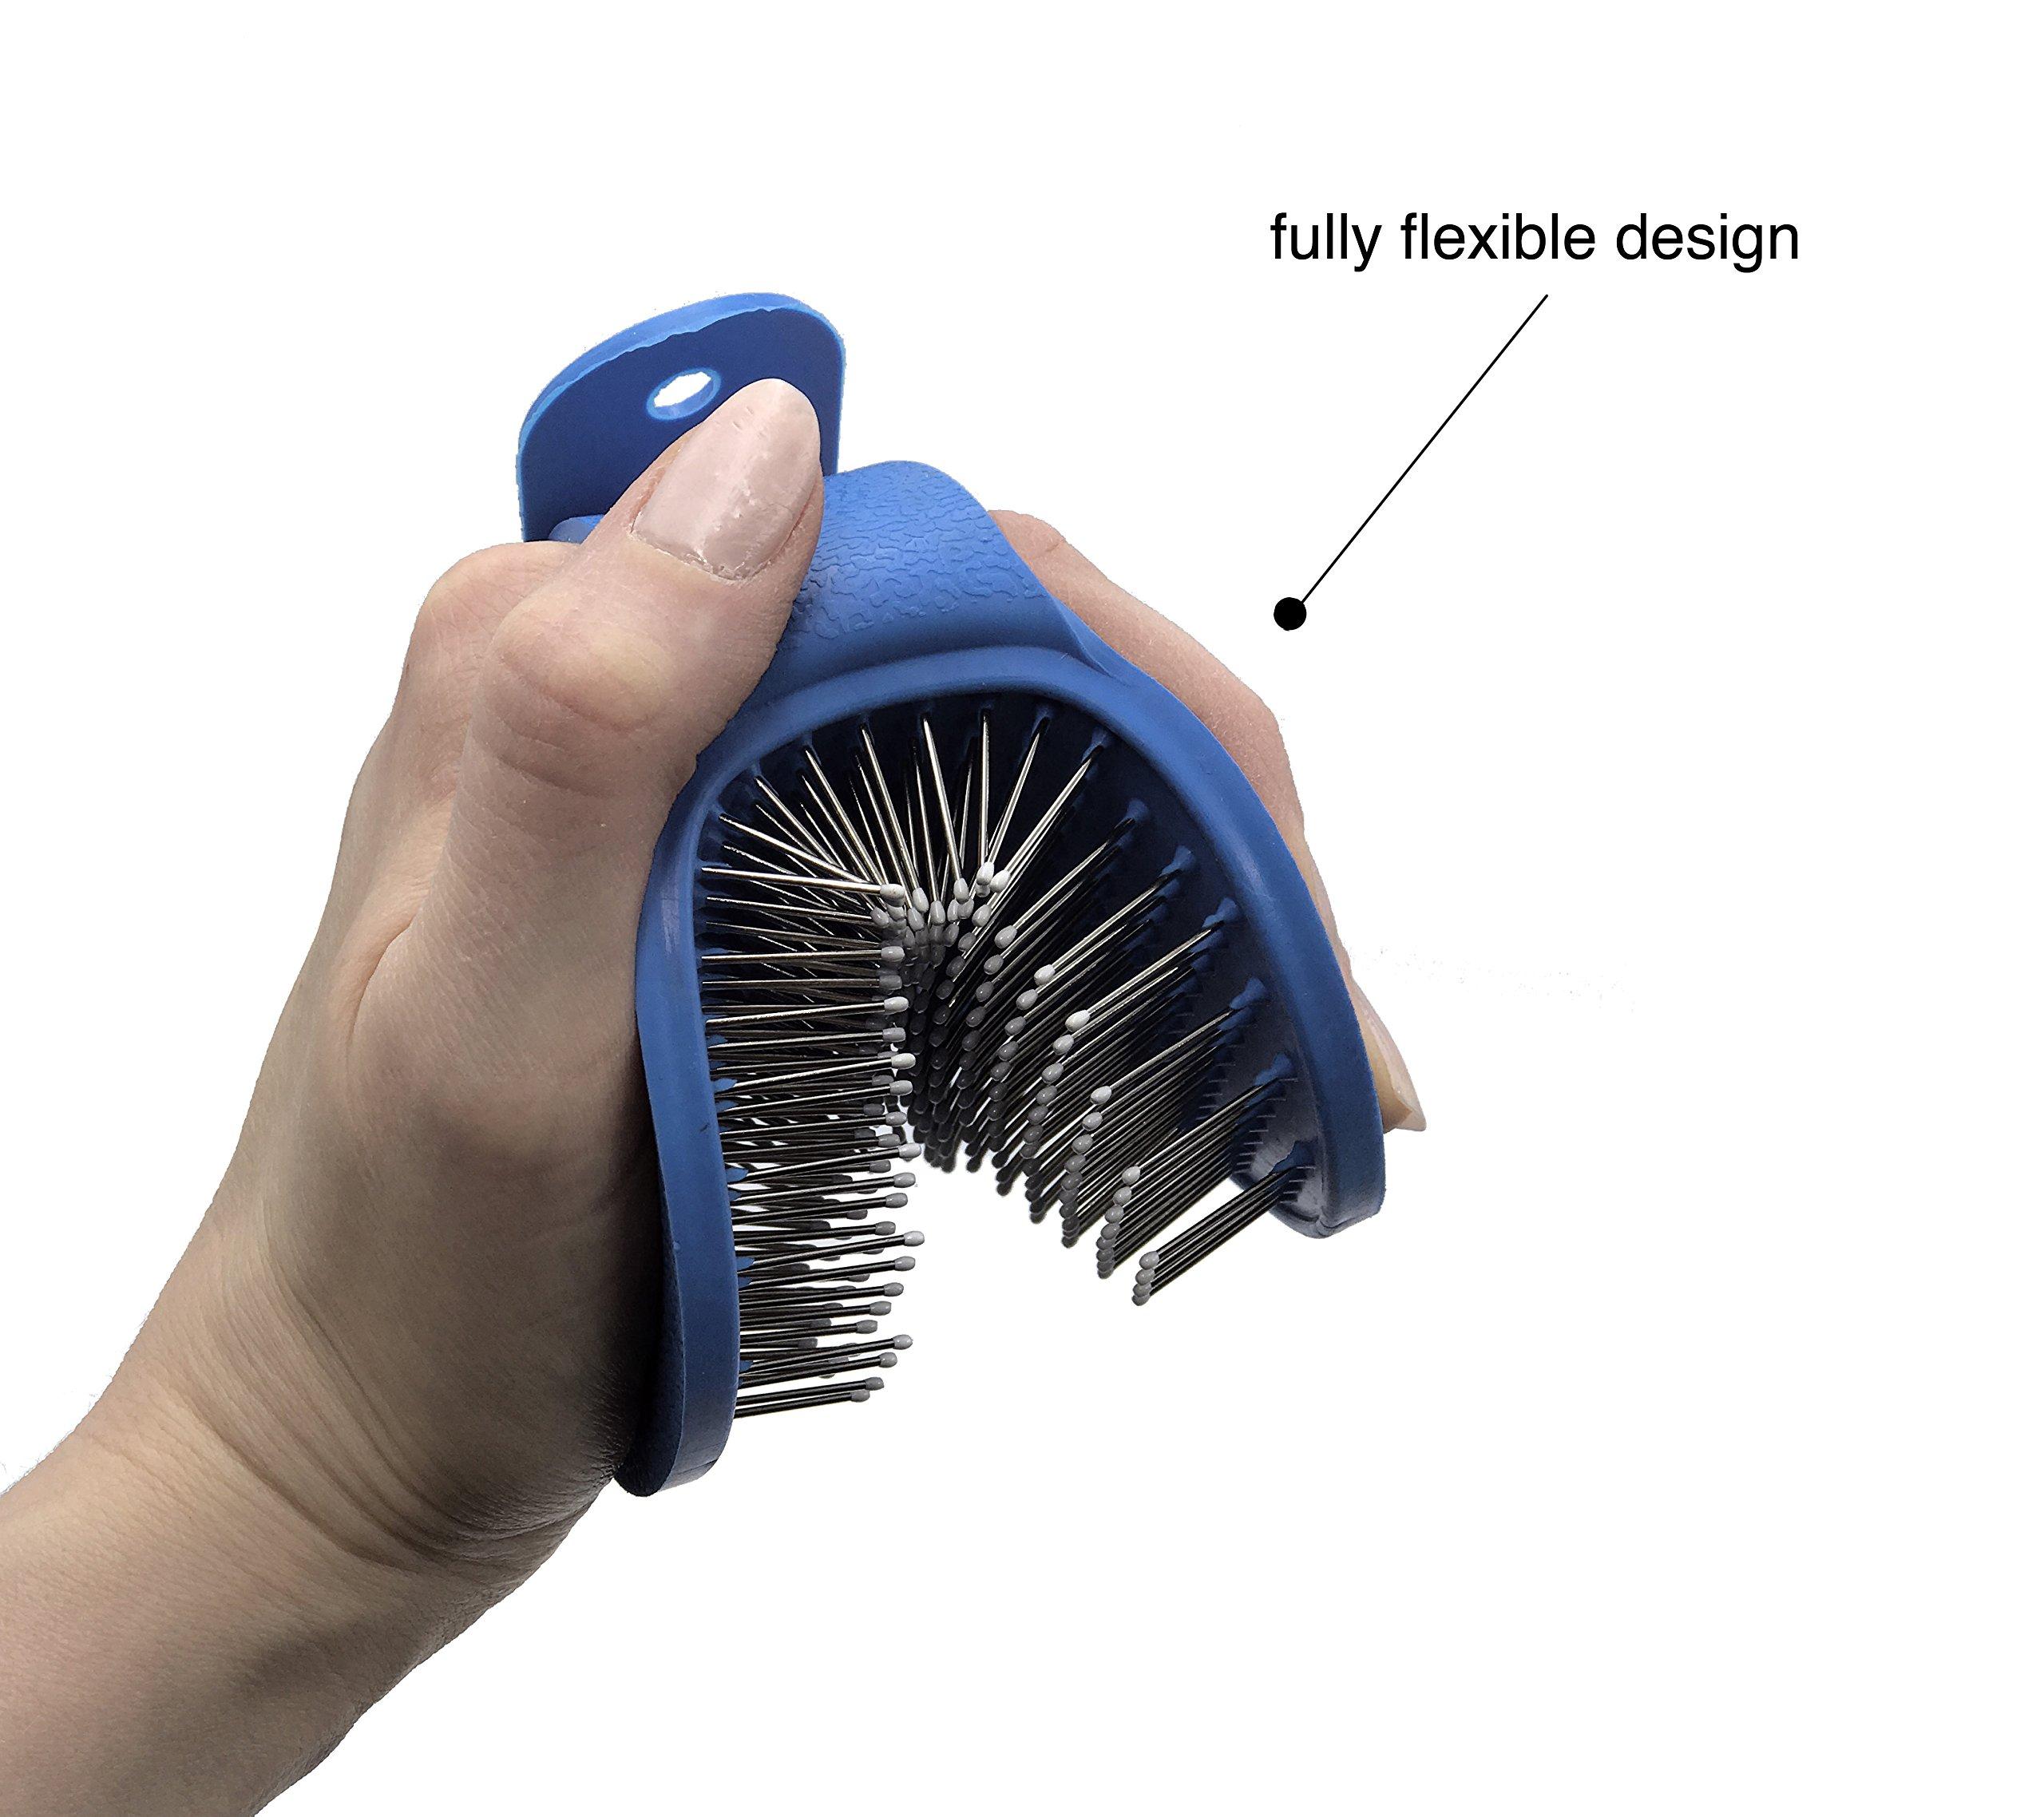 Dasksha Rabbit Grooming Kit Rabbit Grooming Brush The Best Rabbit Hair Brush Rabbit Hair Remover by Dasksha (Image #4)